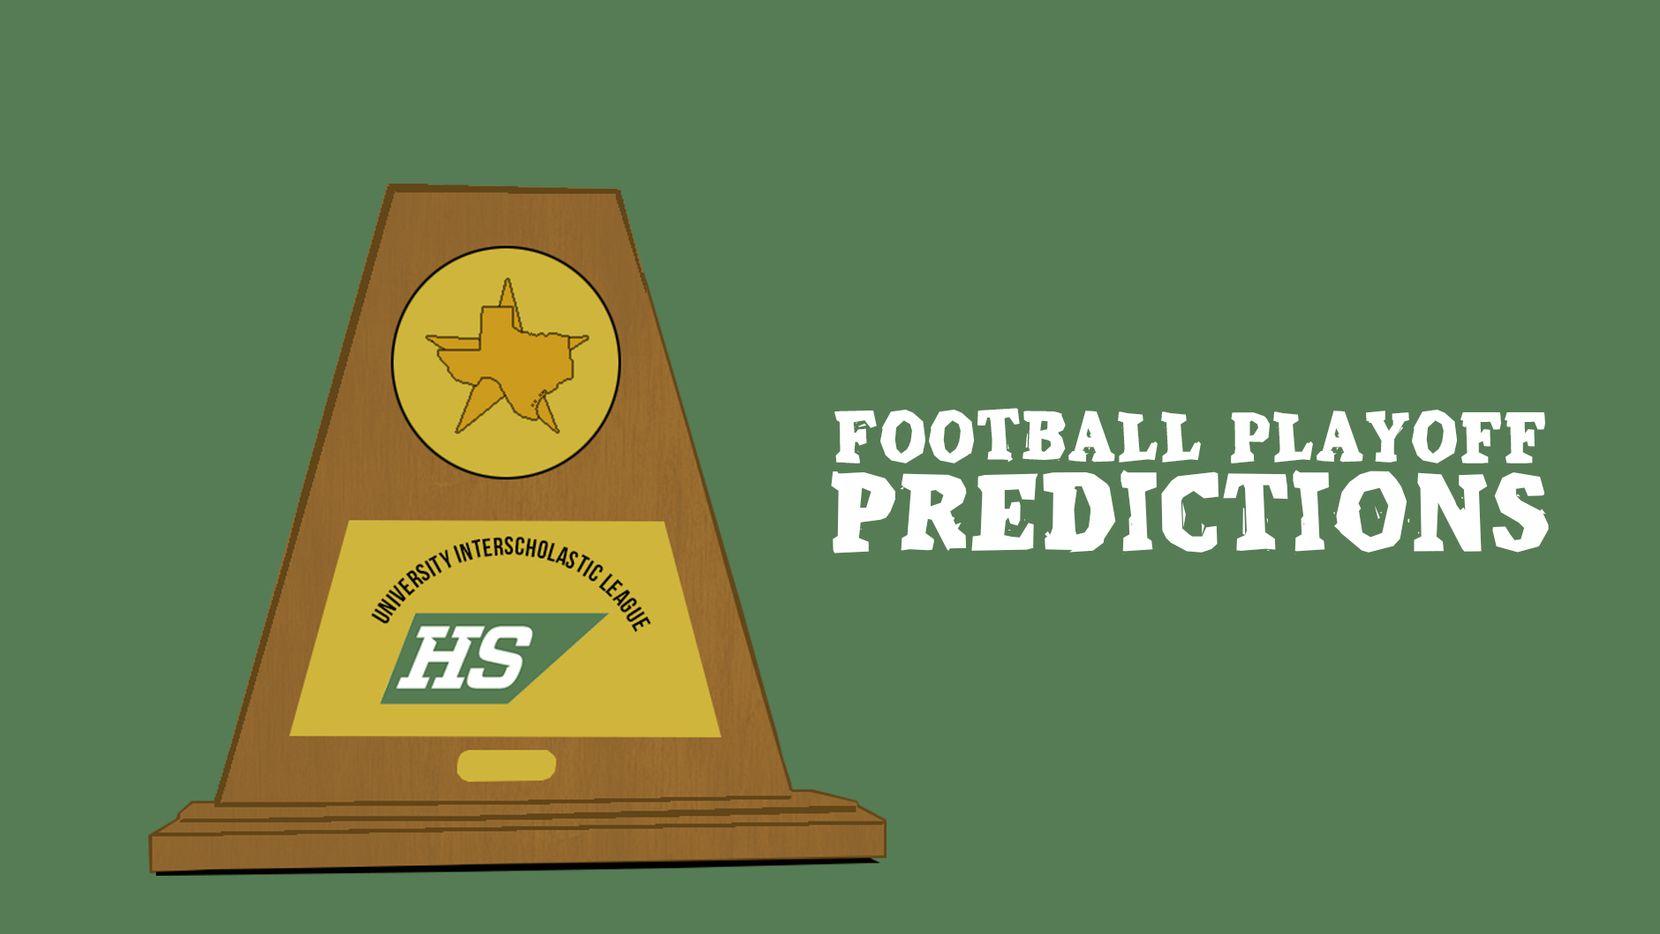 Football playoff predictions.